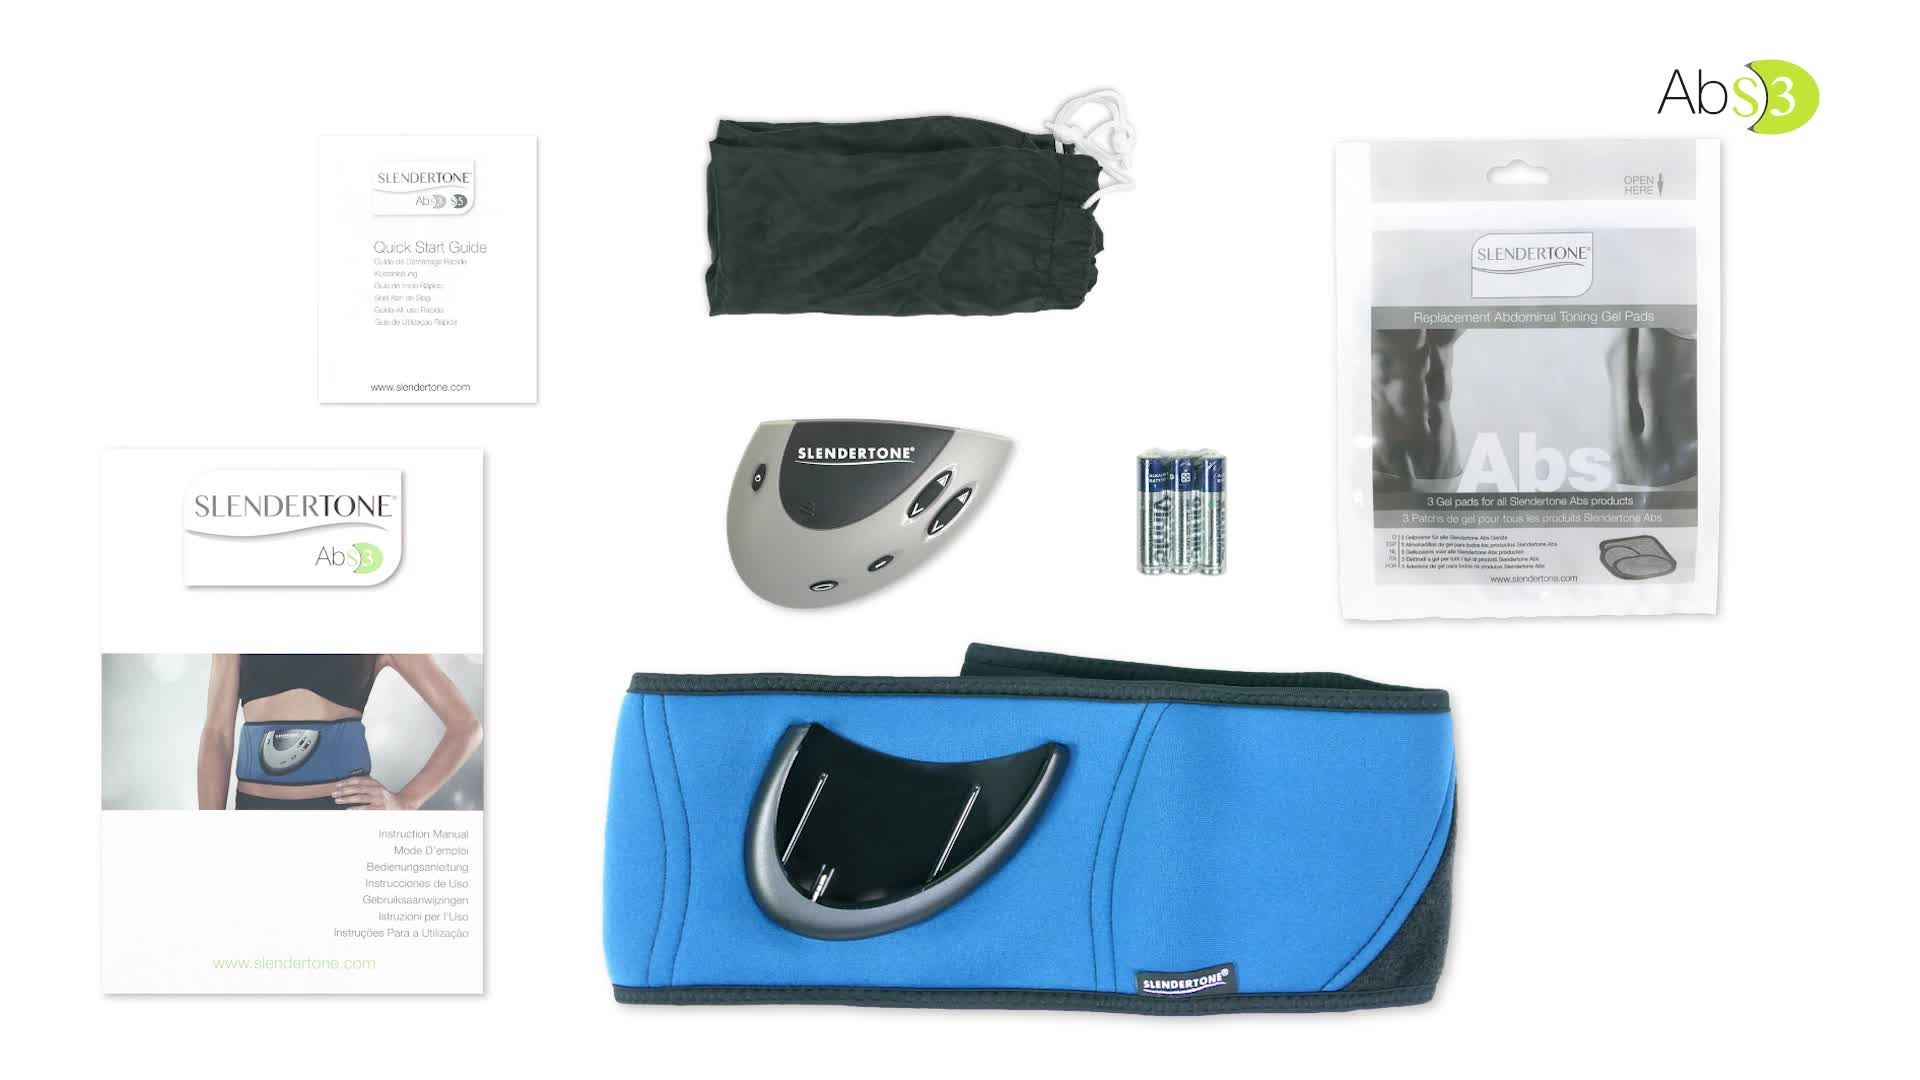 ceinture abdominale slendertone abs3 fitness equipements de sport fnac. Black Bedroom Furniture Sets. Home Design Ideas